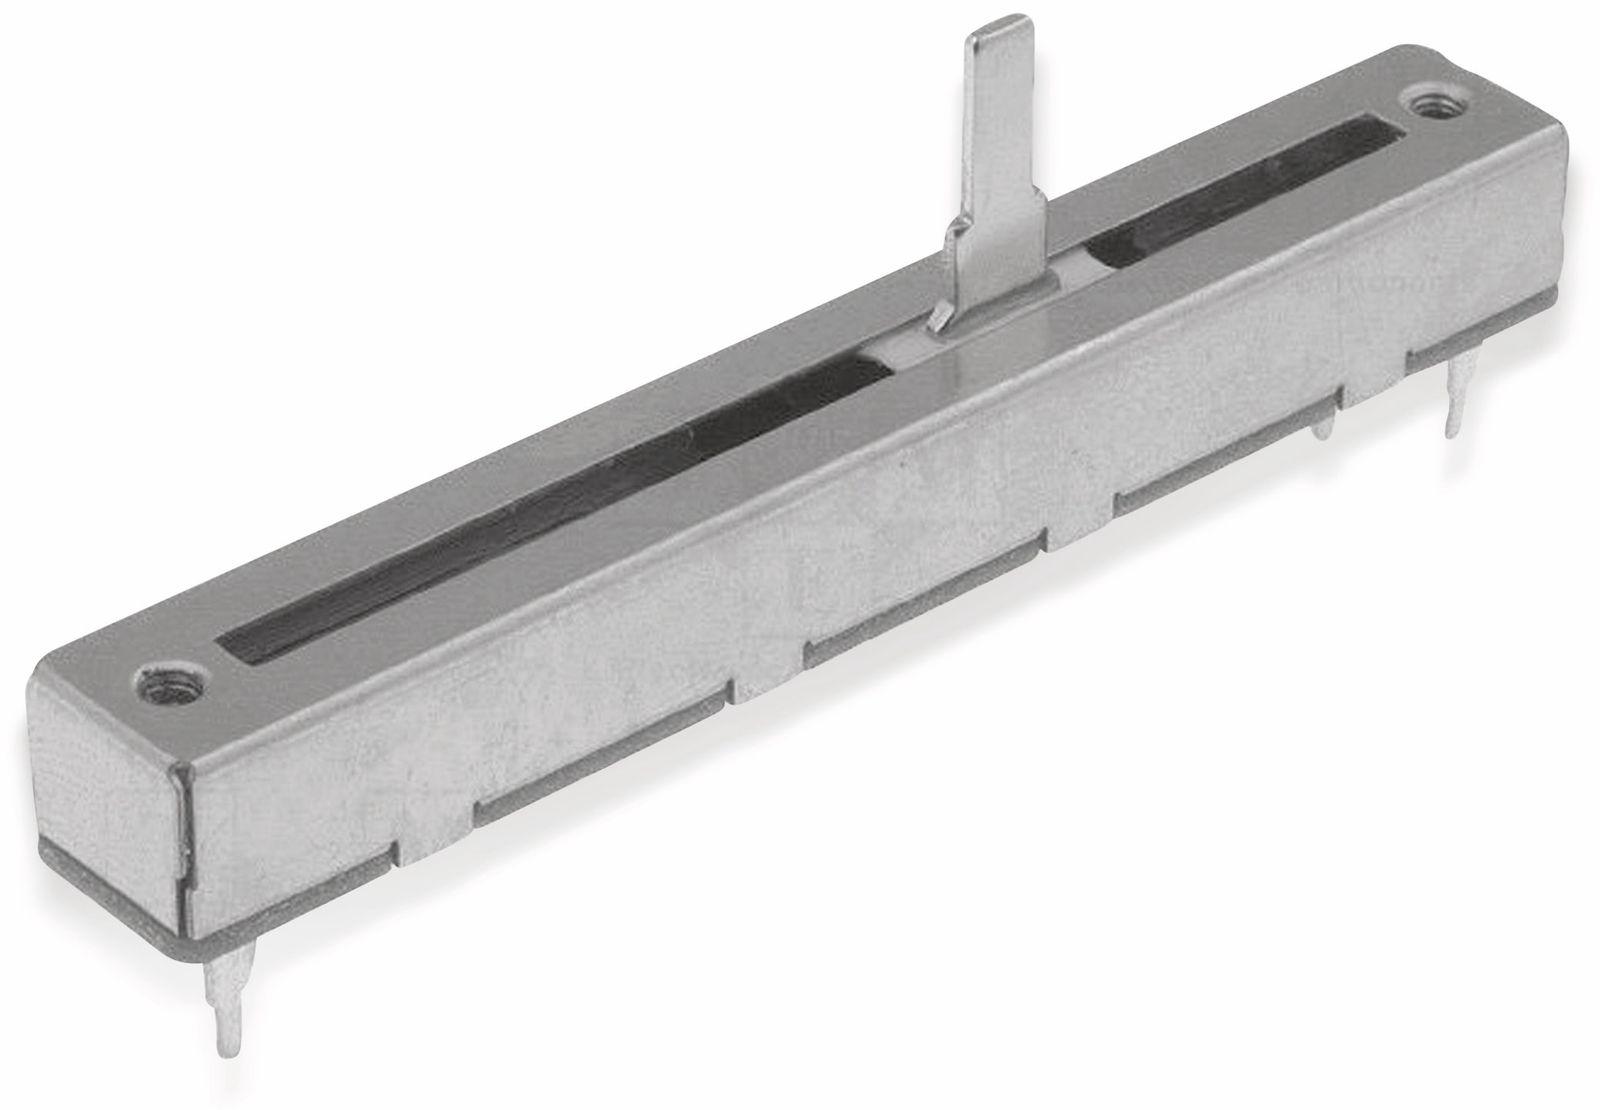 Schiebe Potentiometer 1k Ohm Poti Linear Mono Schiebepoti Schieberegler 500mW